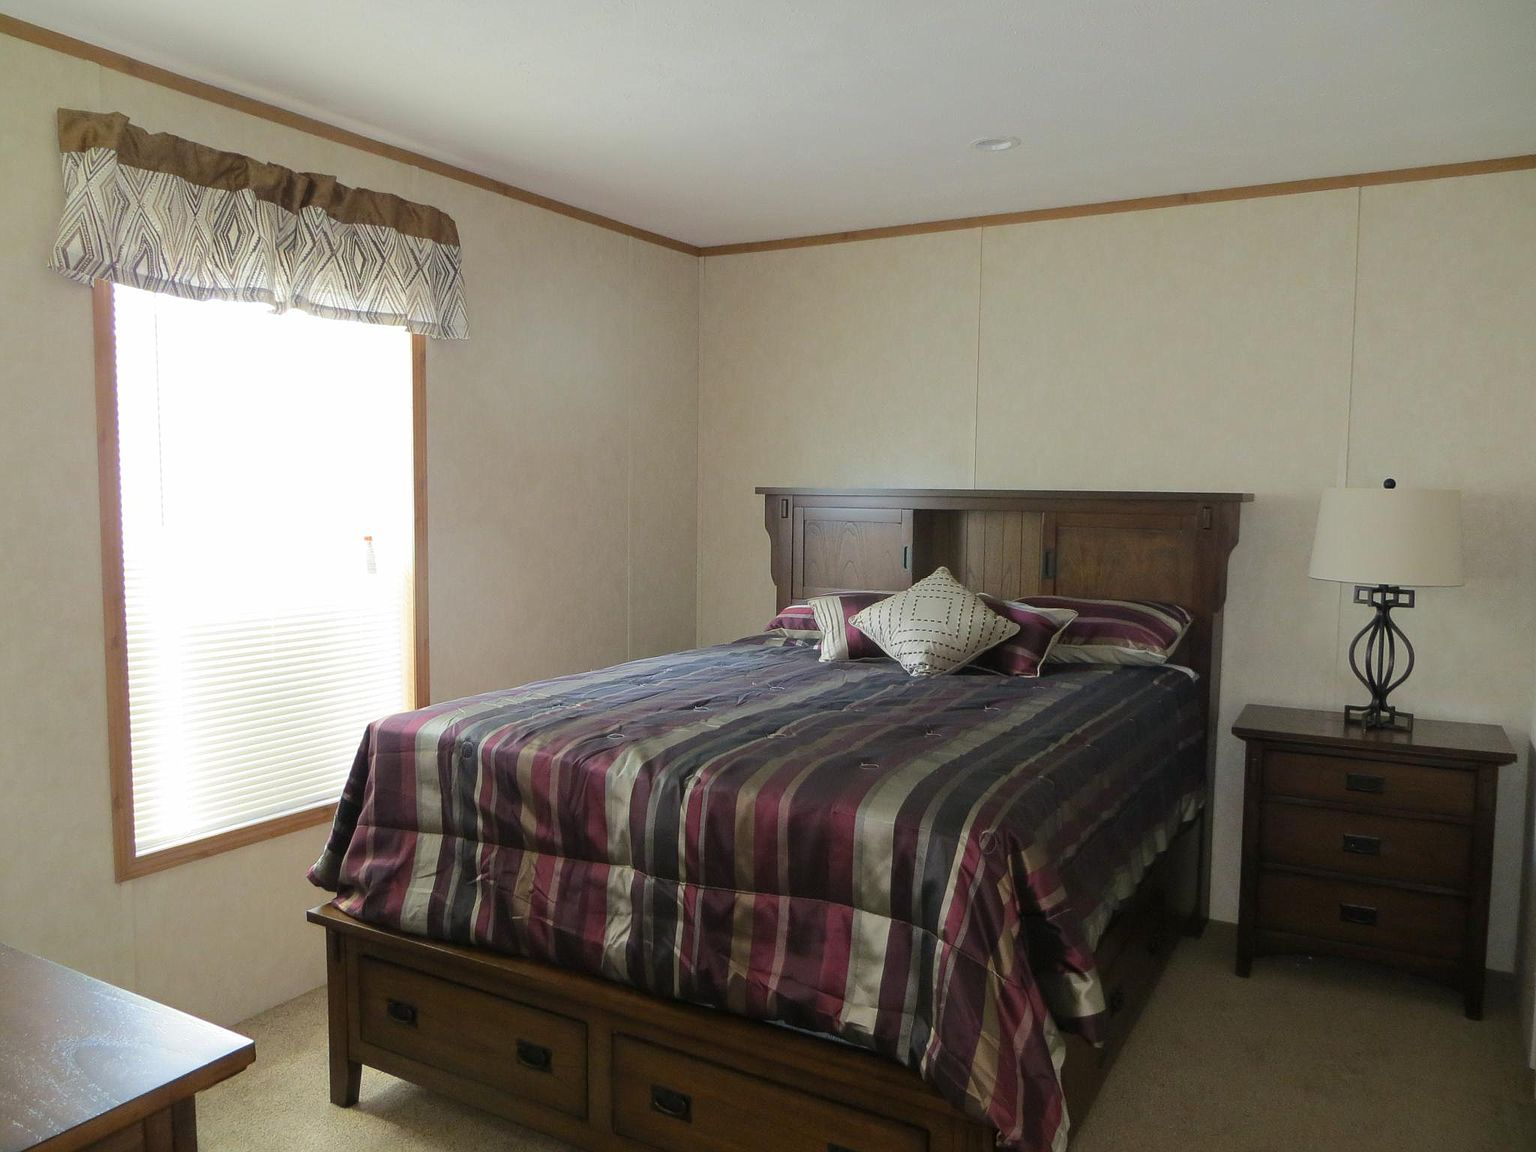 200 Old Owego Rd, Apalachin, Ny 13732 | Zillow within Save More Furniture Owego Ny